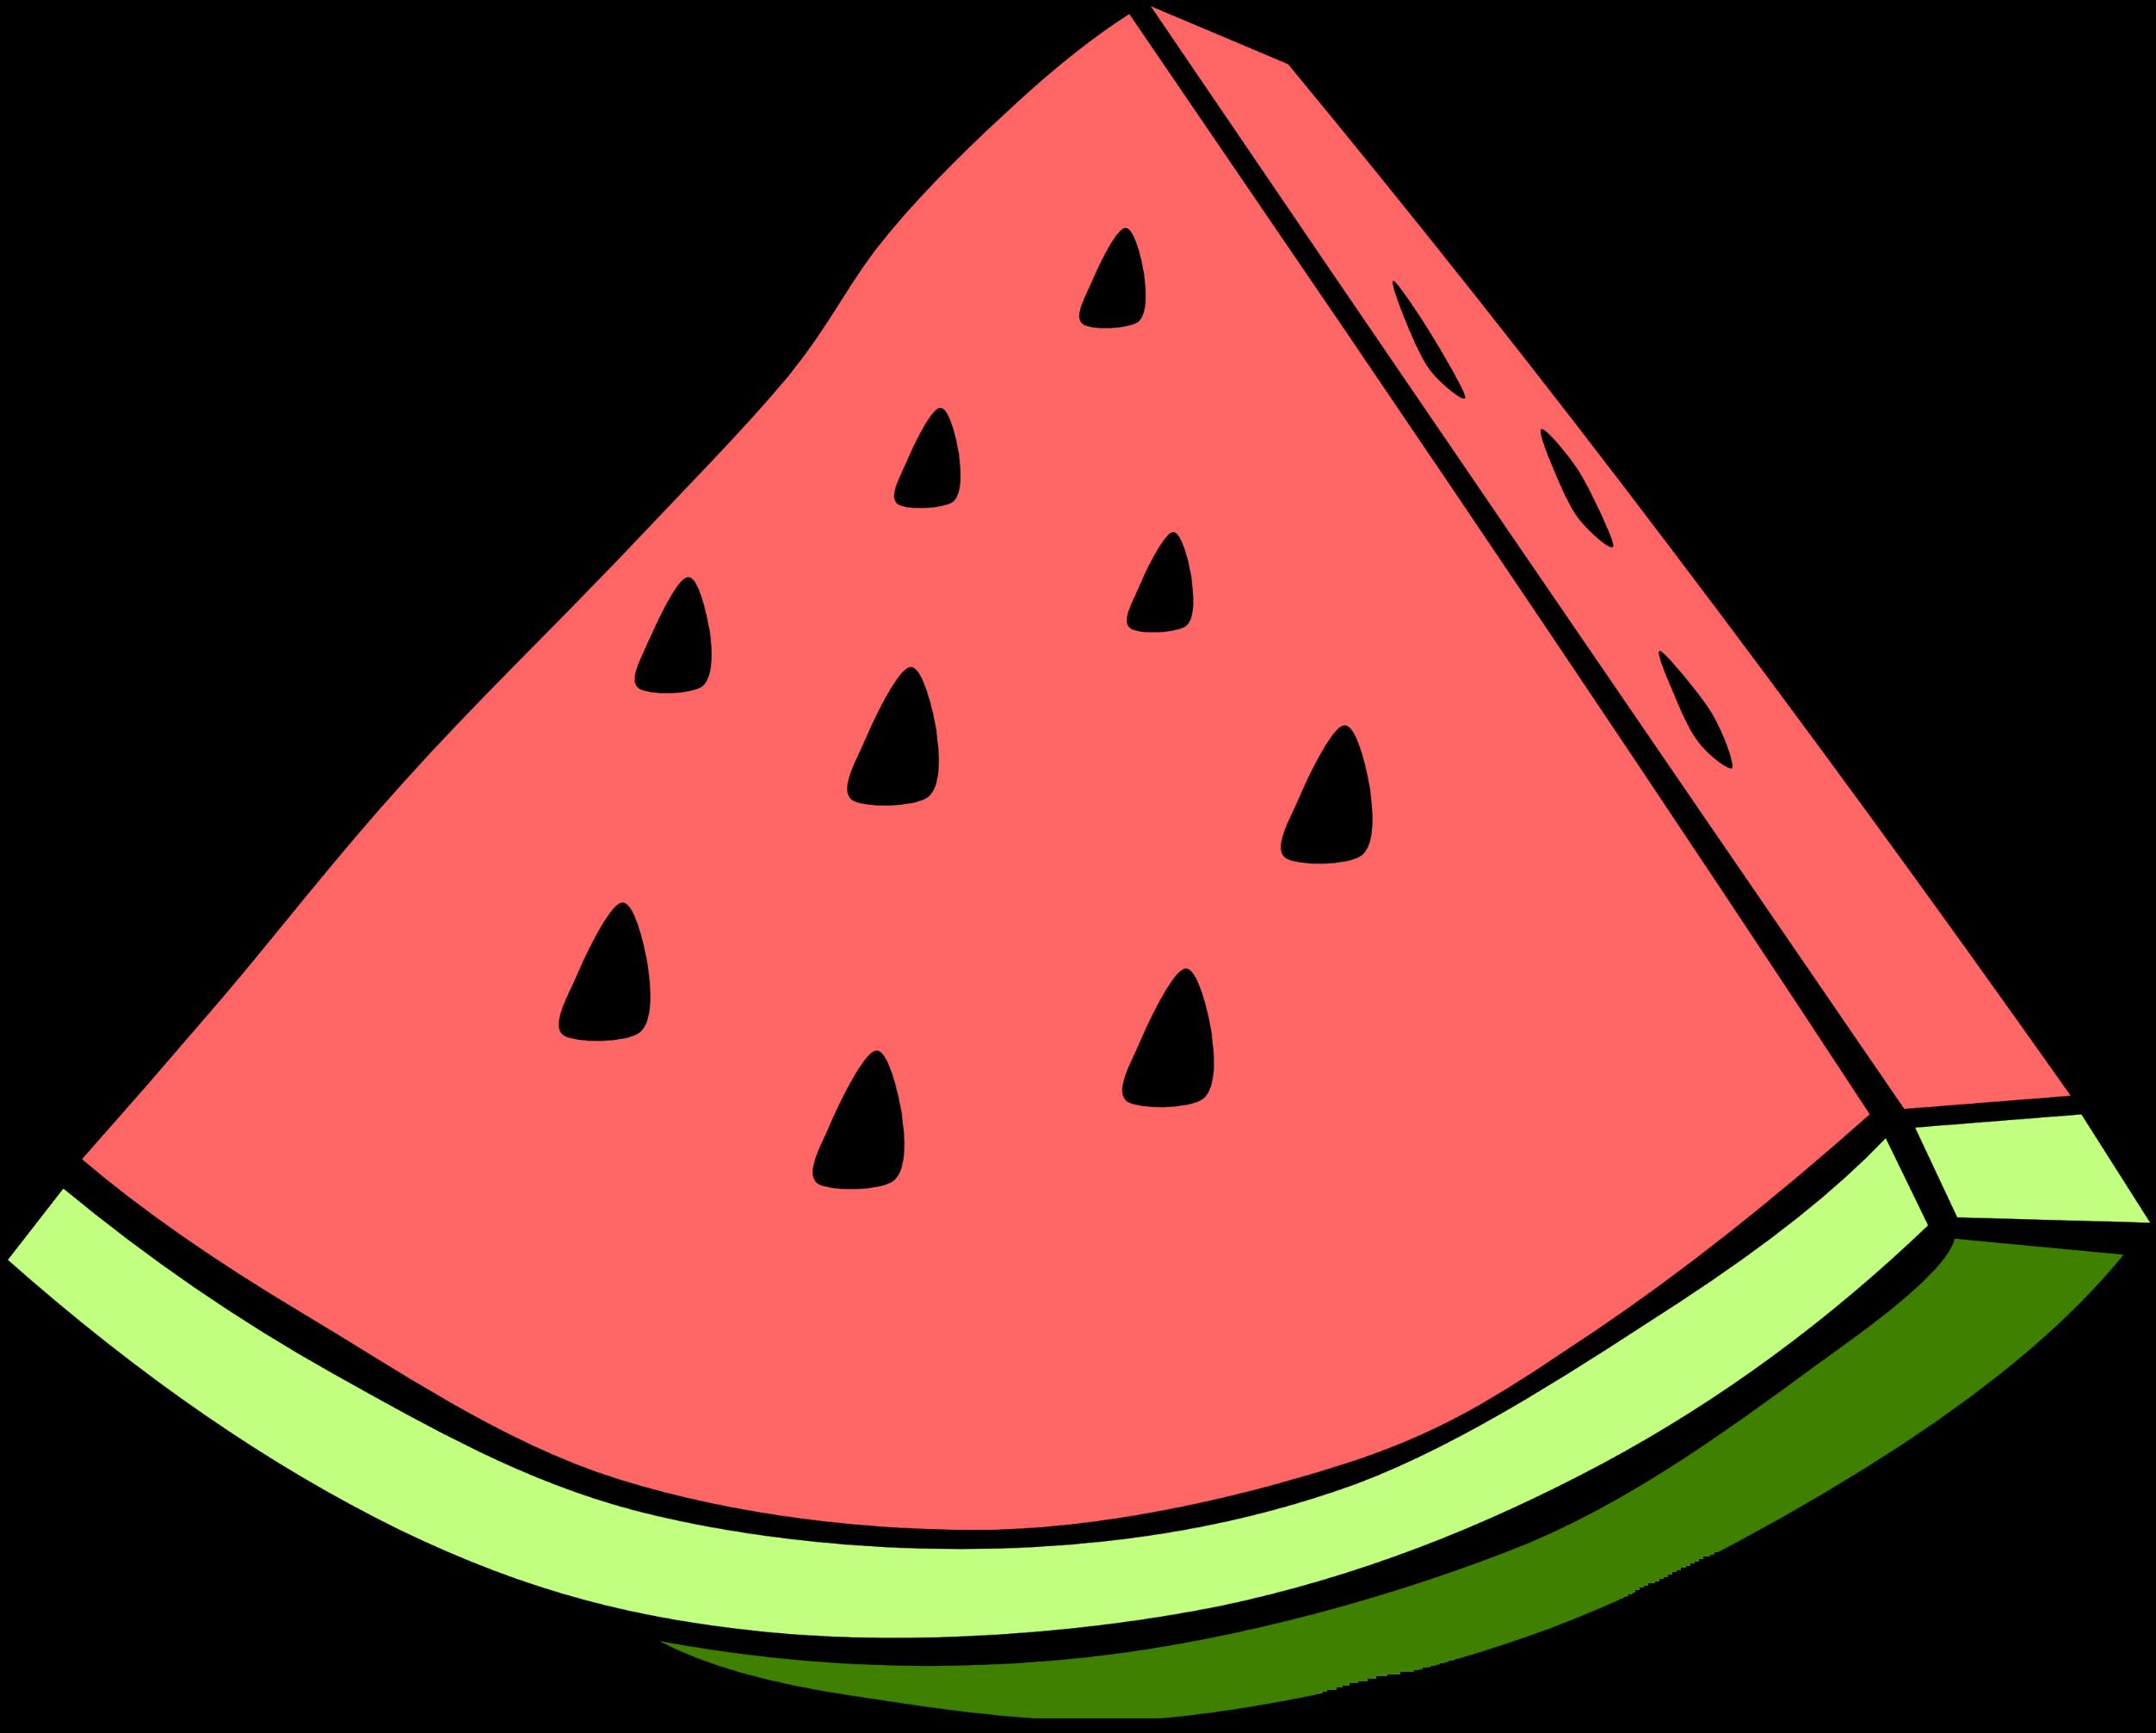 Pineapple clipart watermelon. Drawing clip art transprent